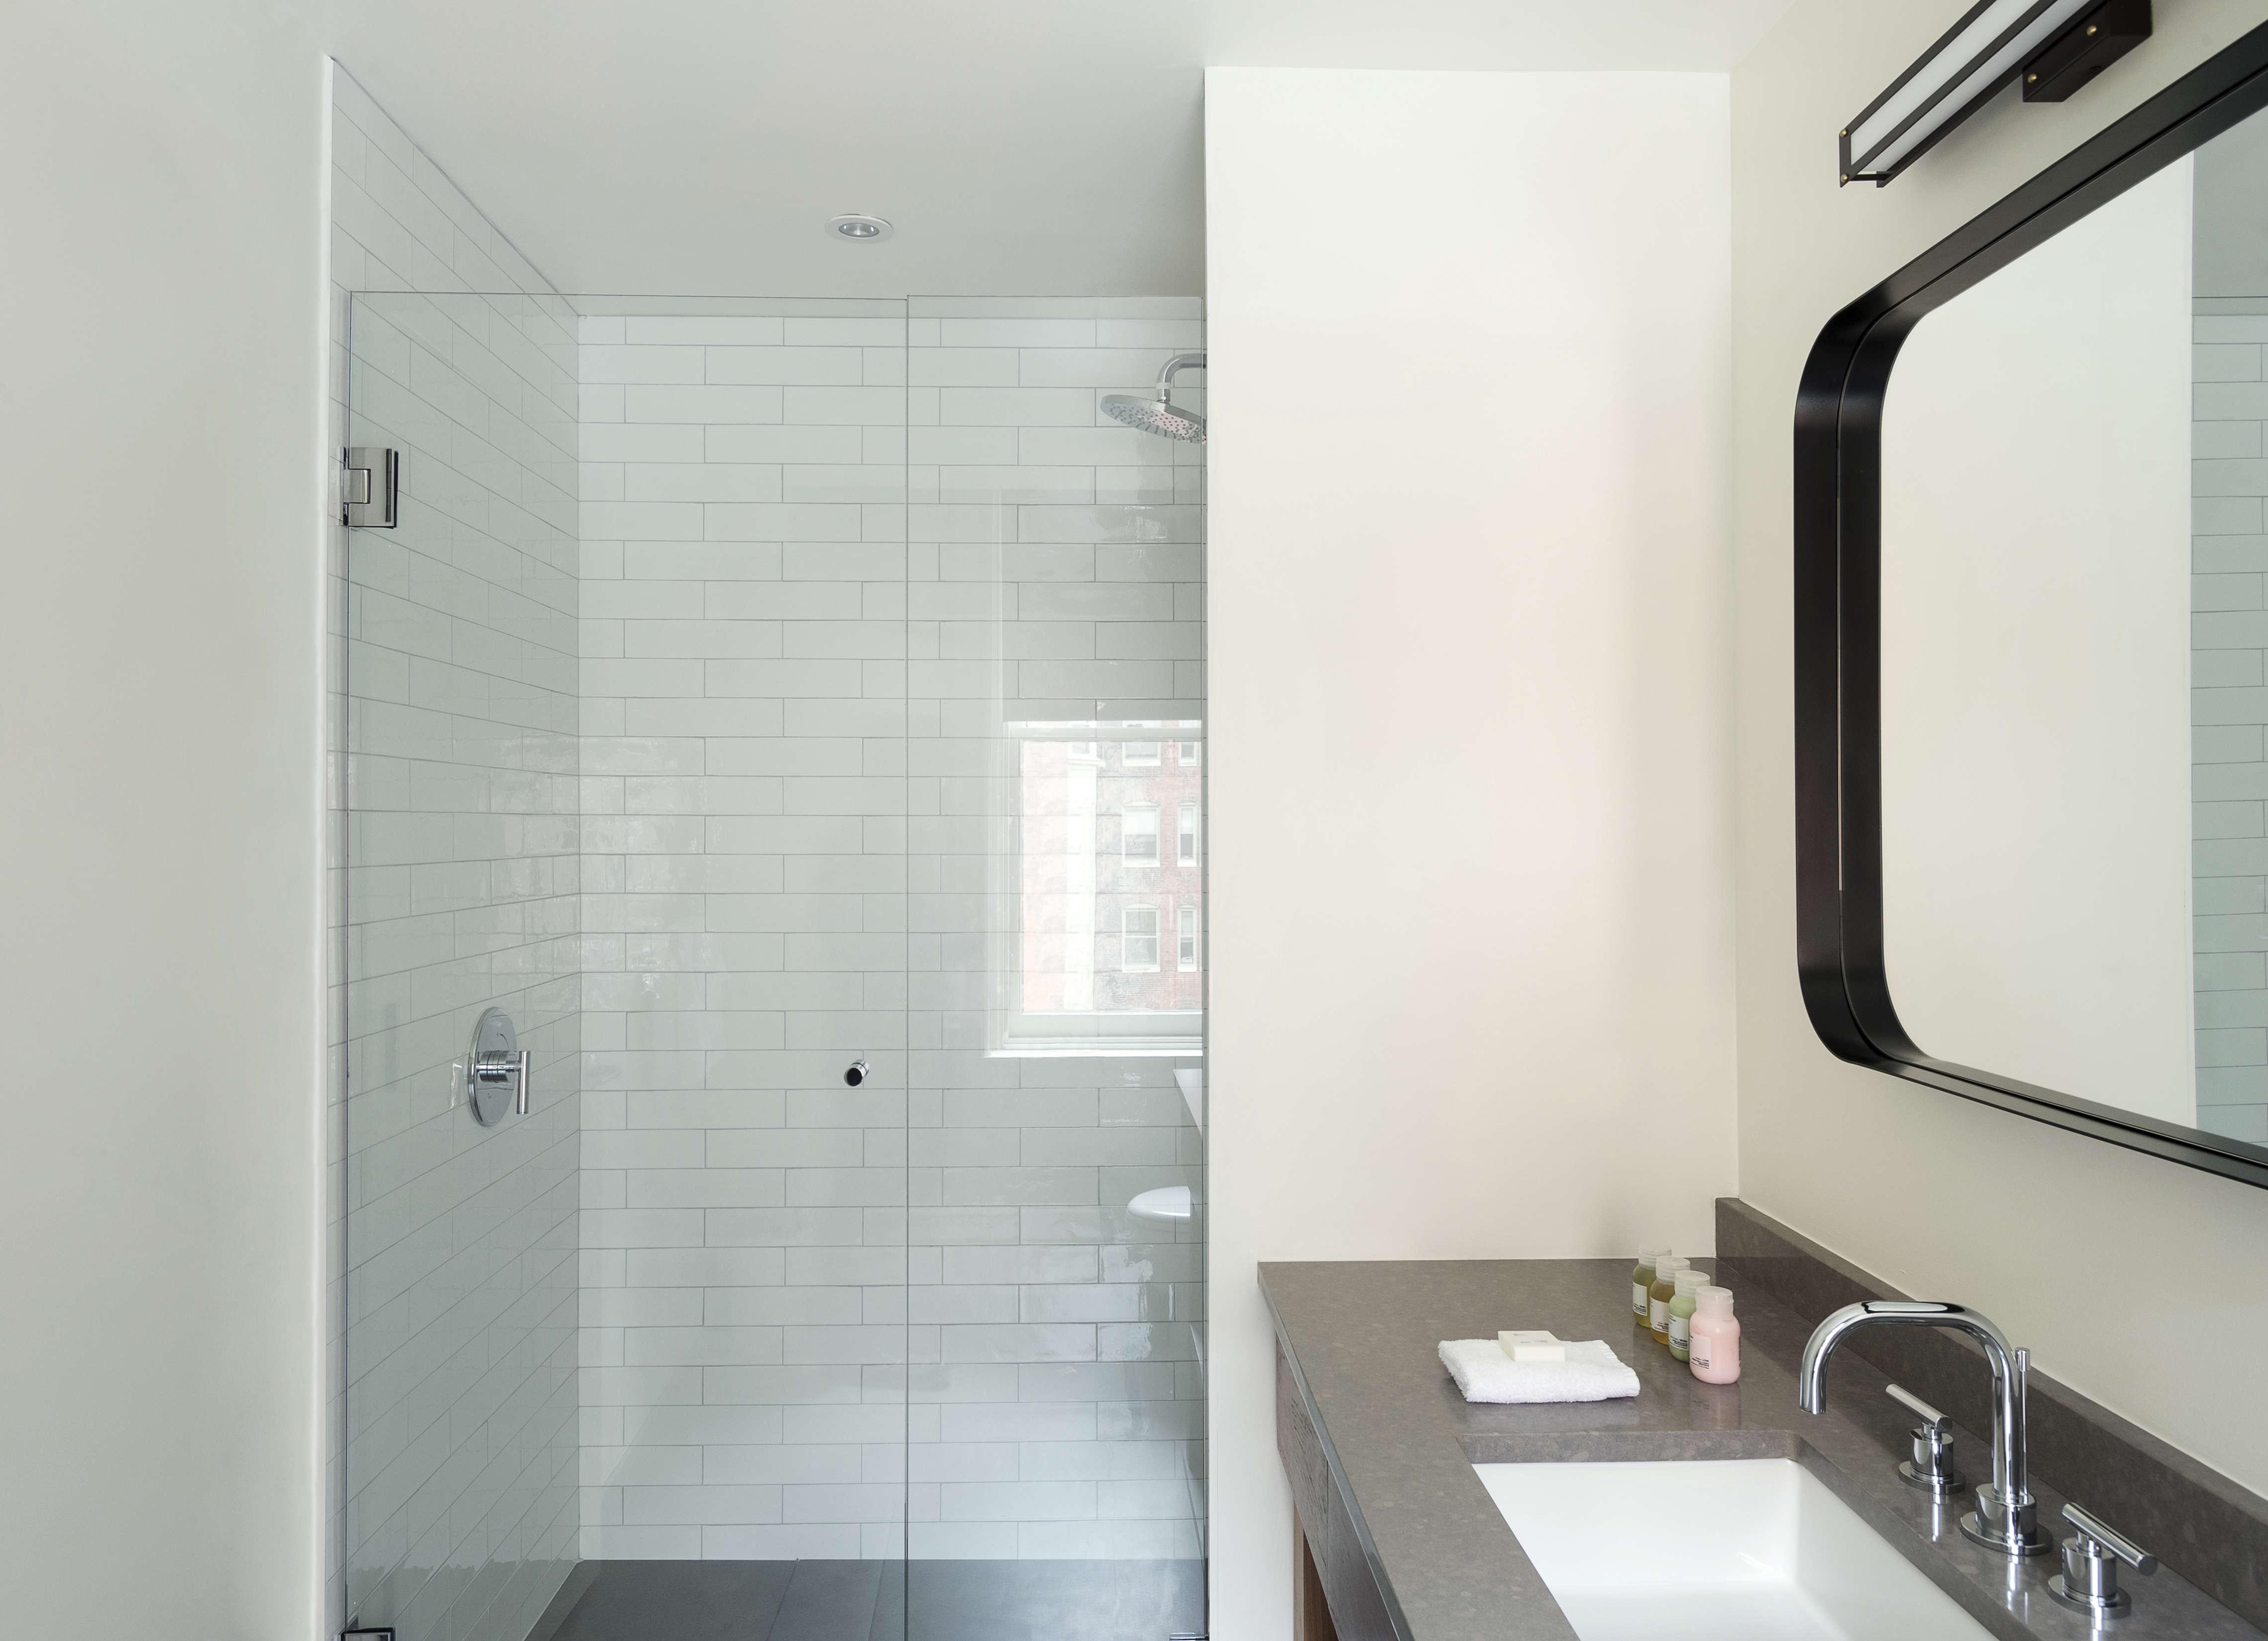 Inspirational Above Bathroom amenities are from Italian brand Davines